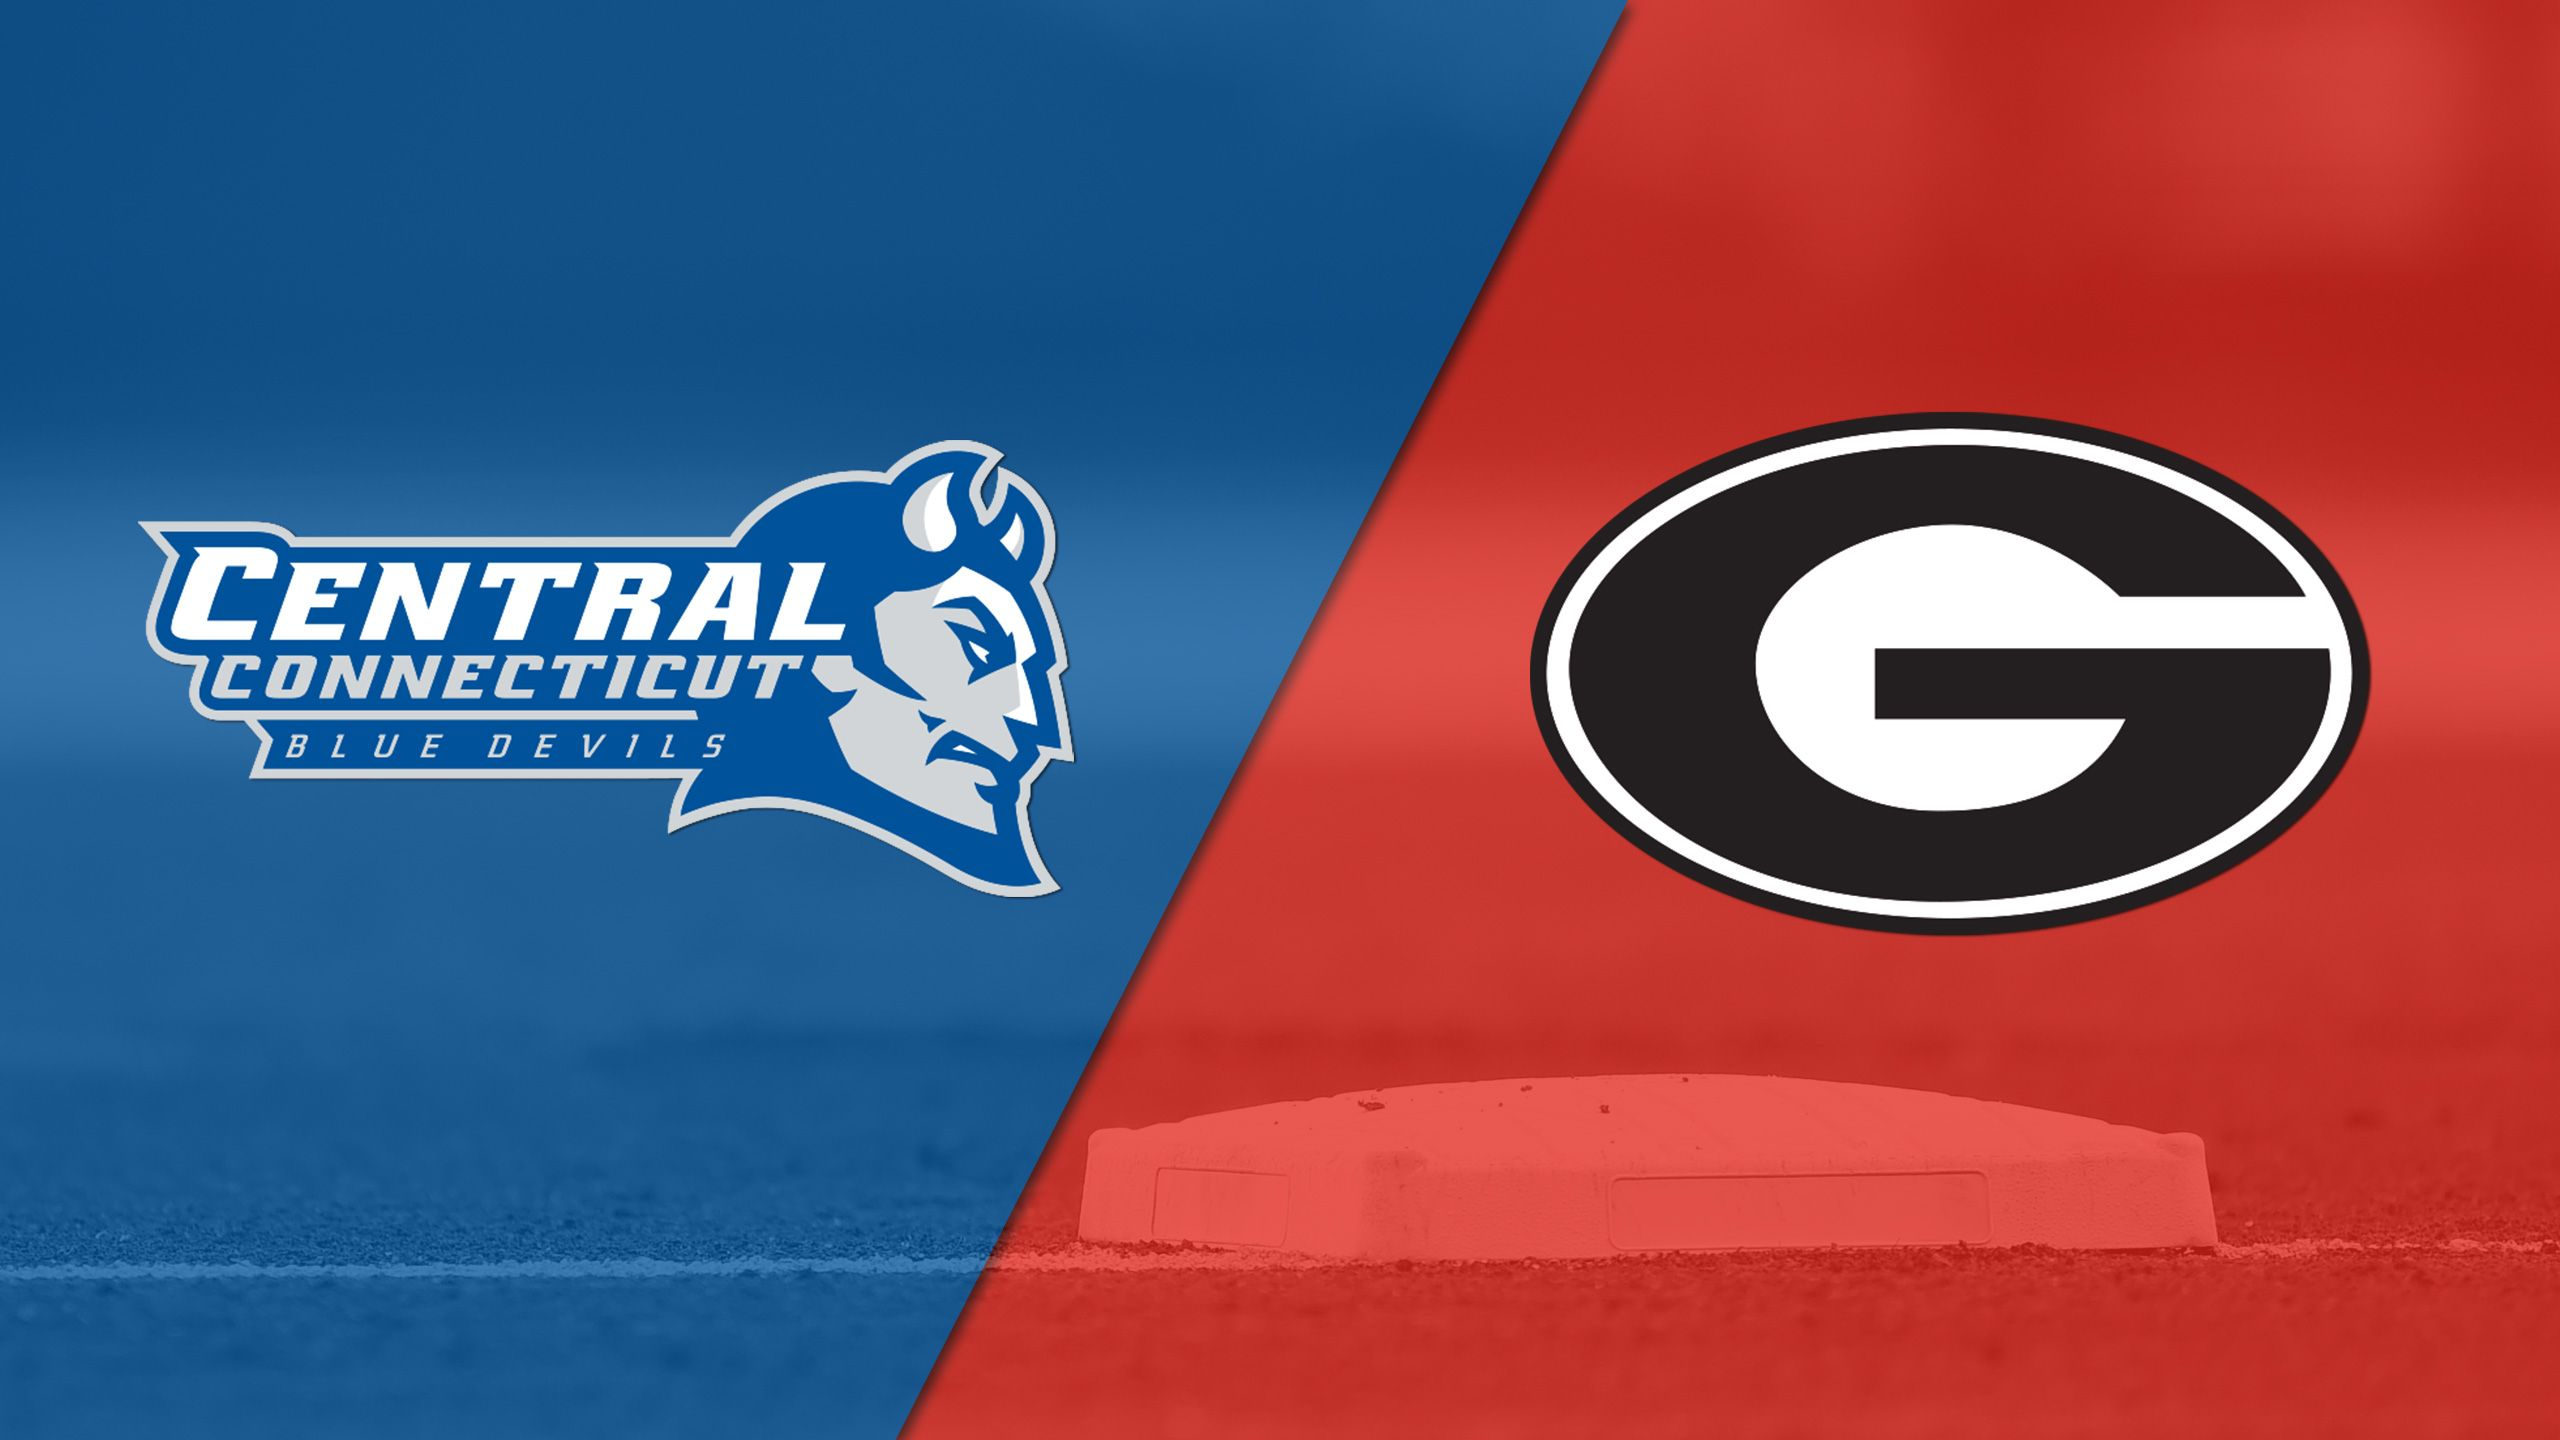 Central Connecticut State vs. #17 Georgia (Softball)